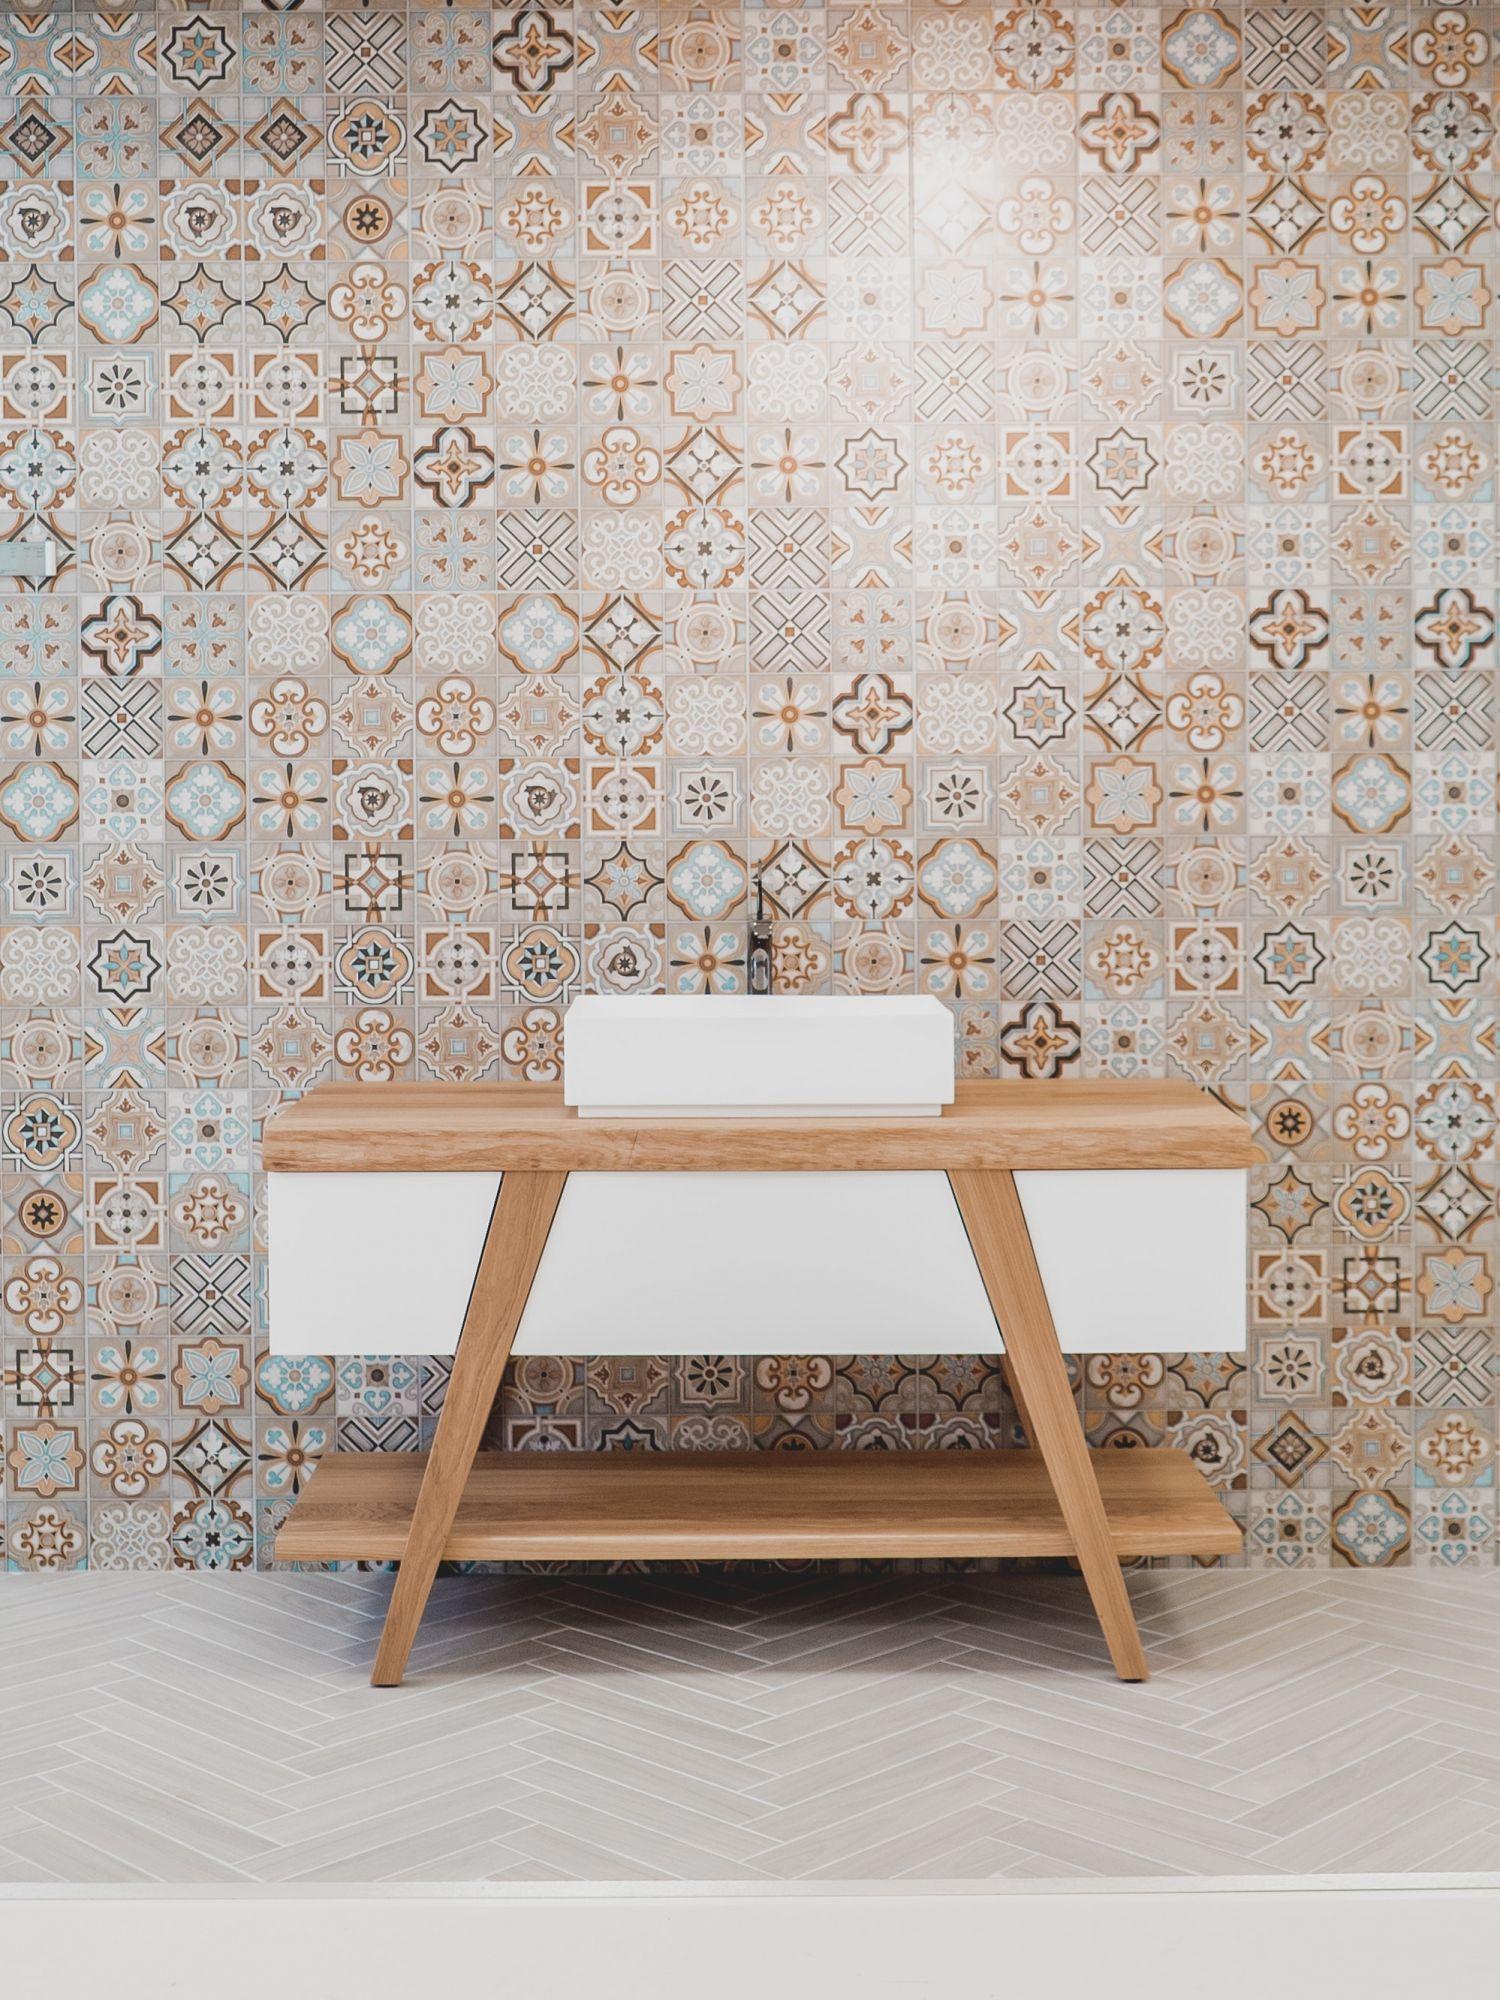 Bagno di design: rivestimenti d'eccellenza